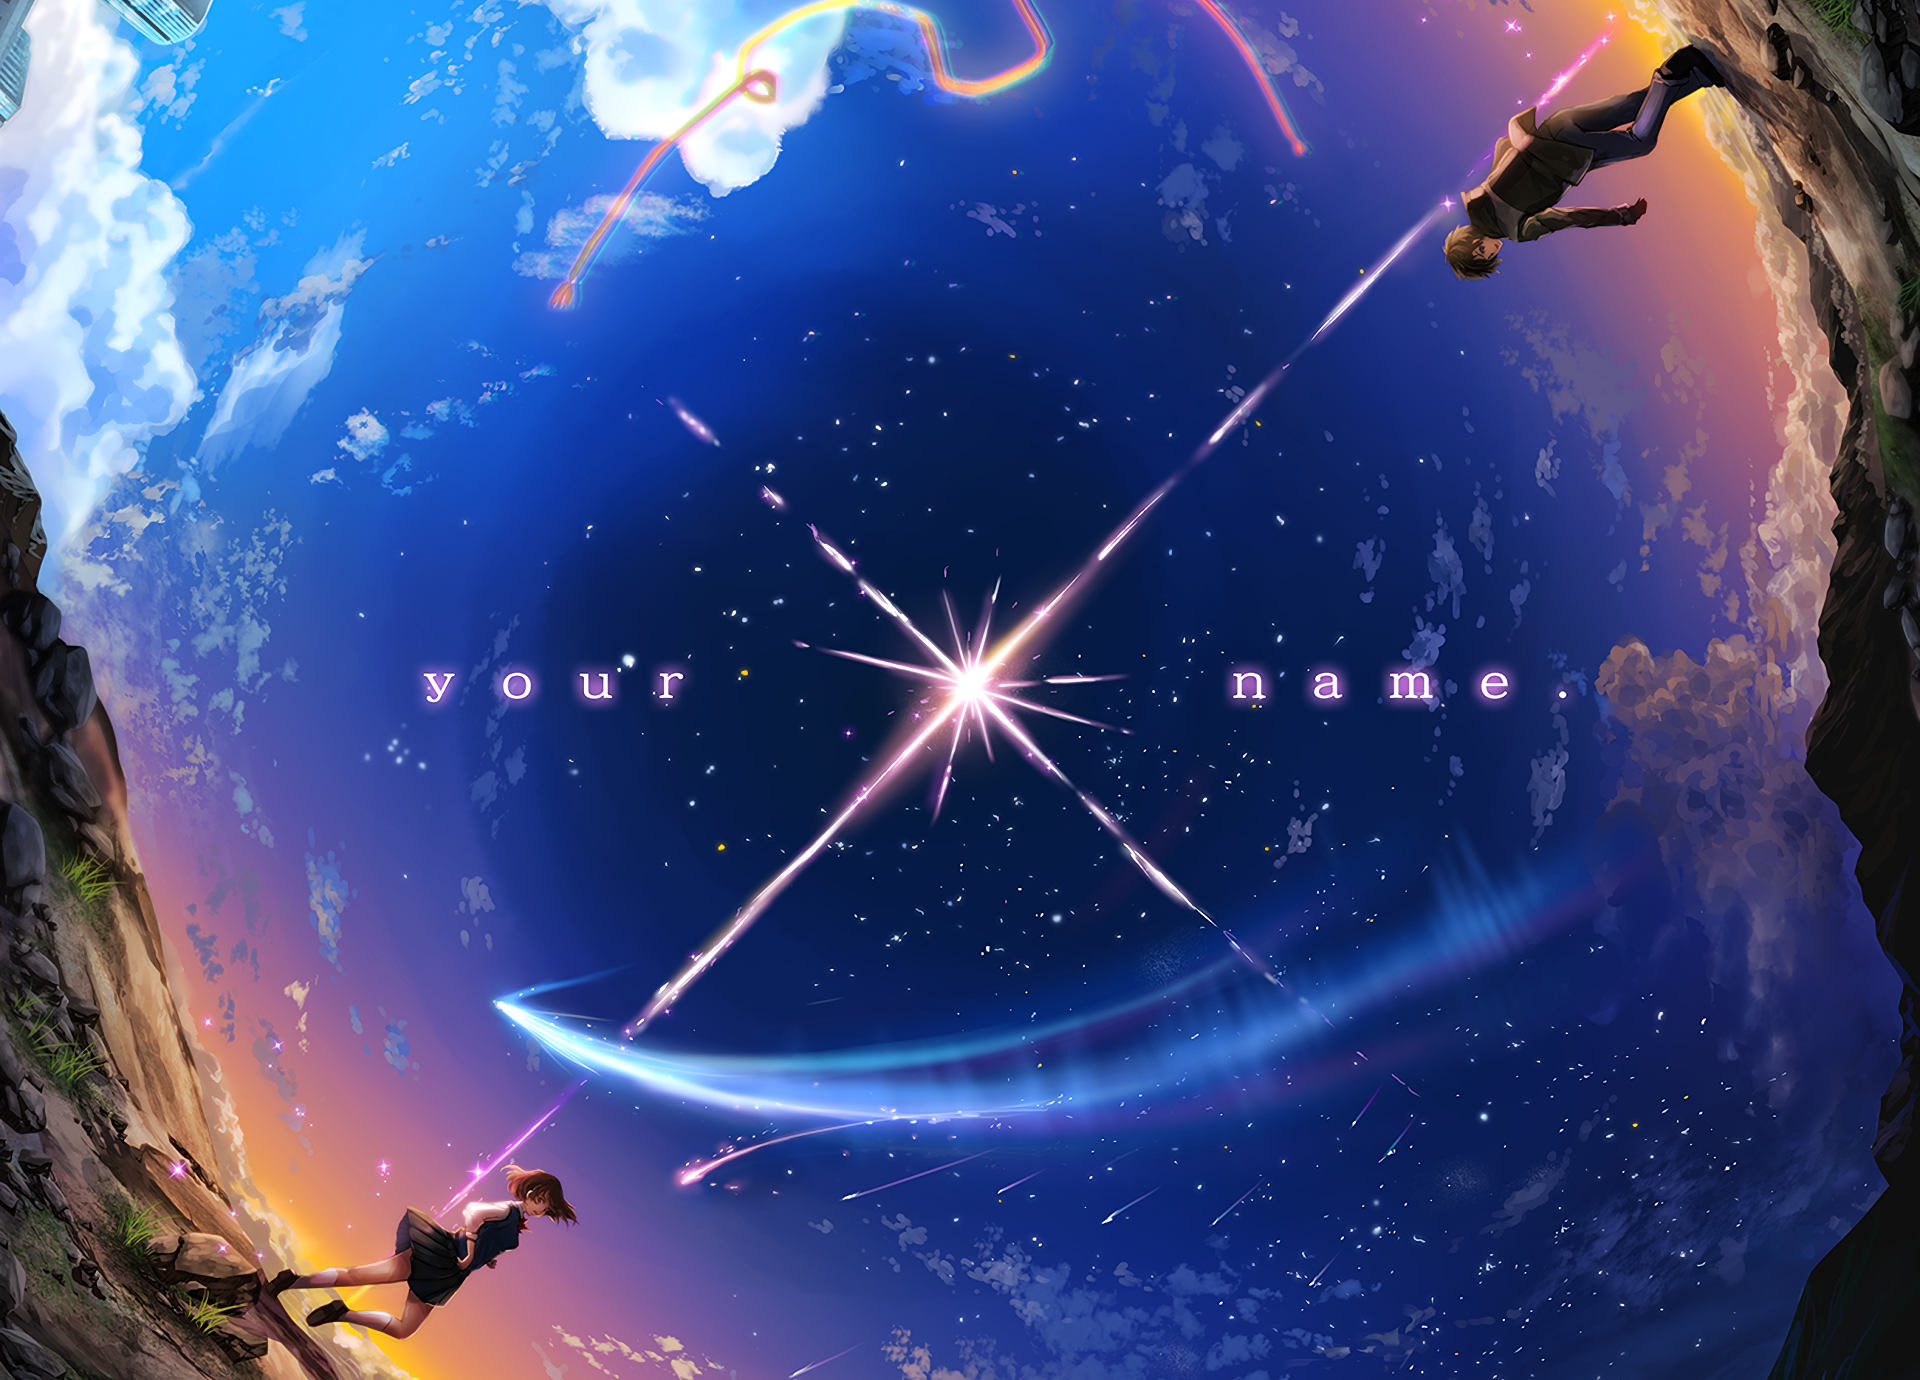 Anime Your Name Desktop Wallpapers Top Free Anime Your